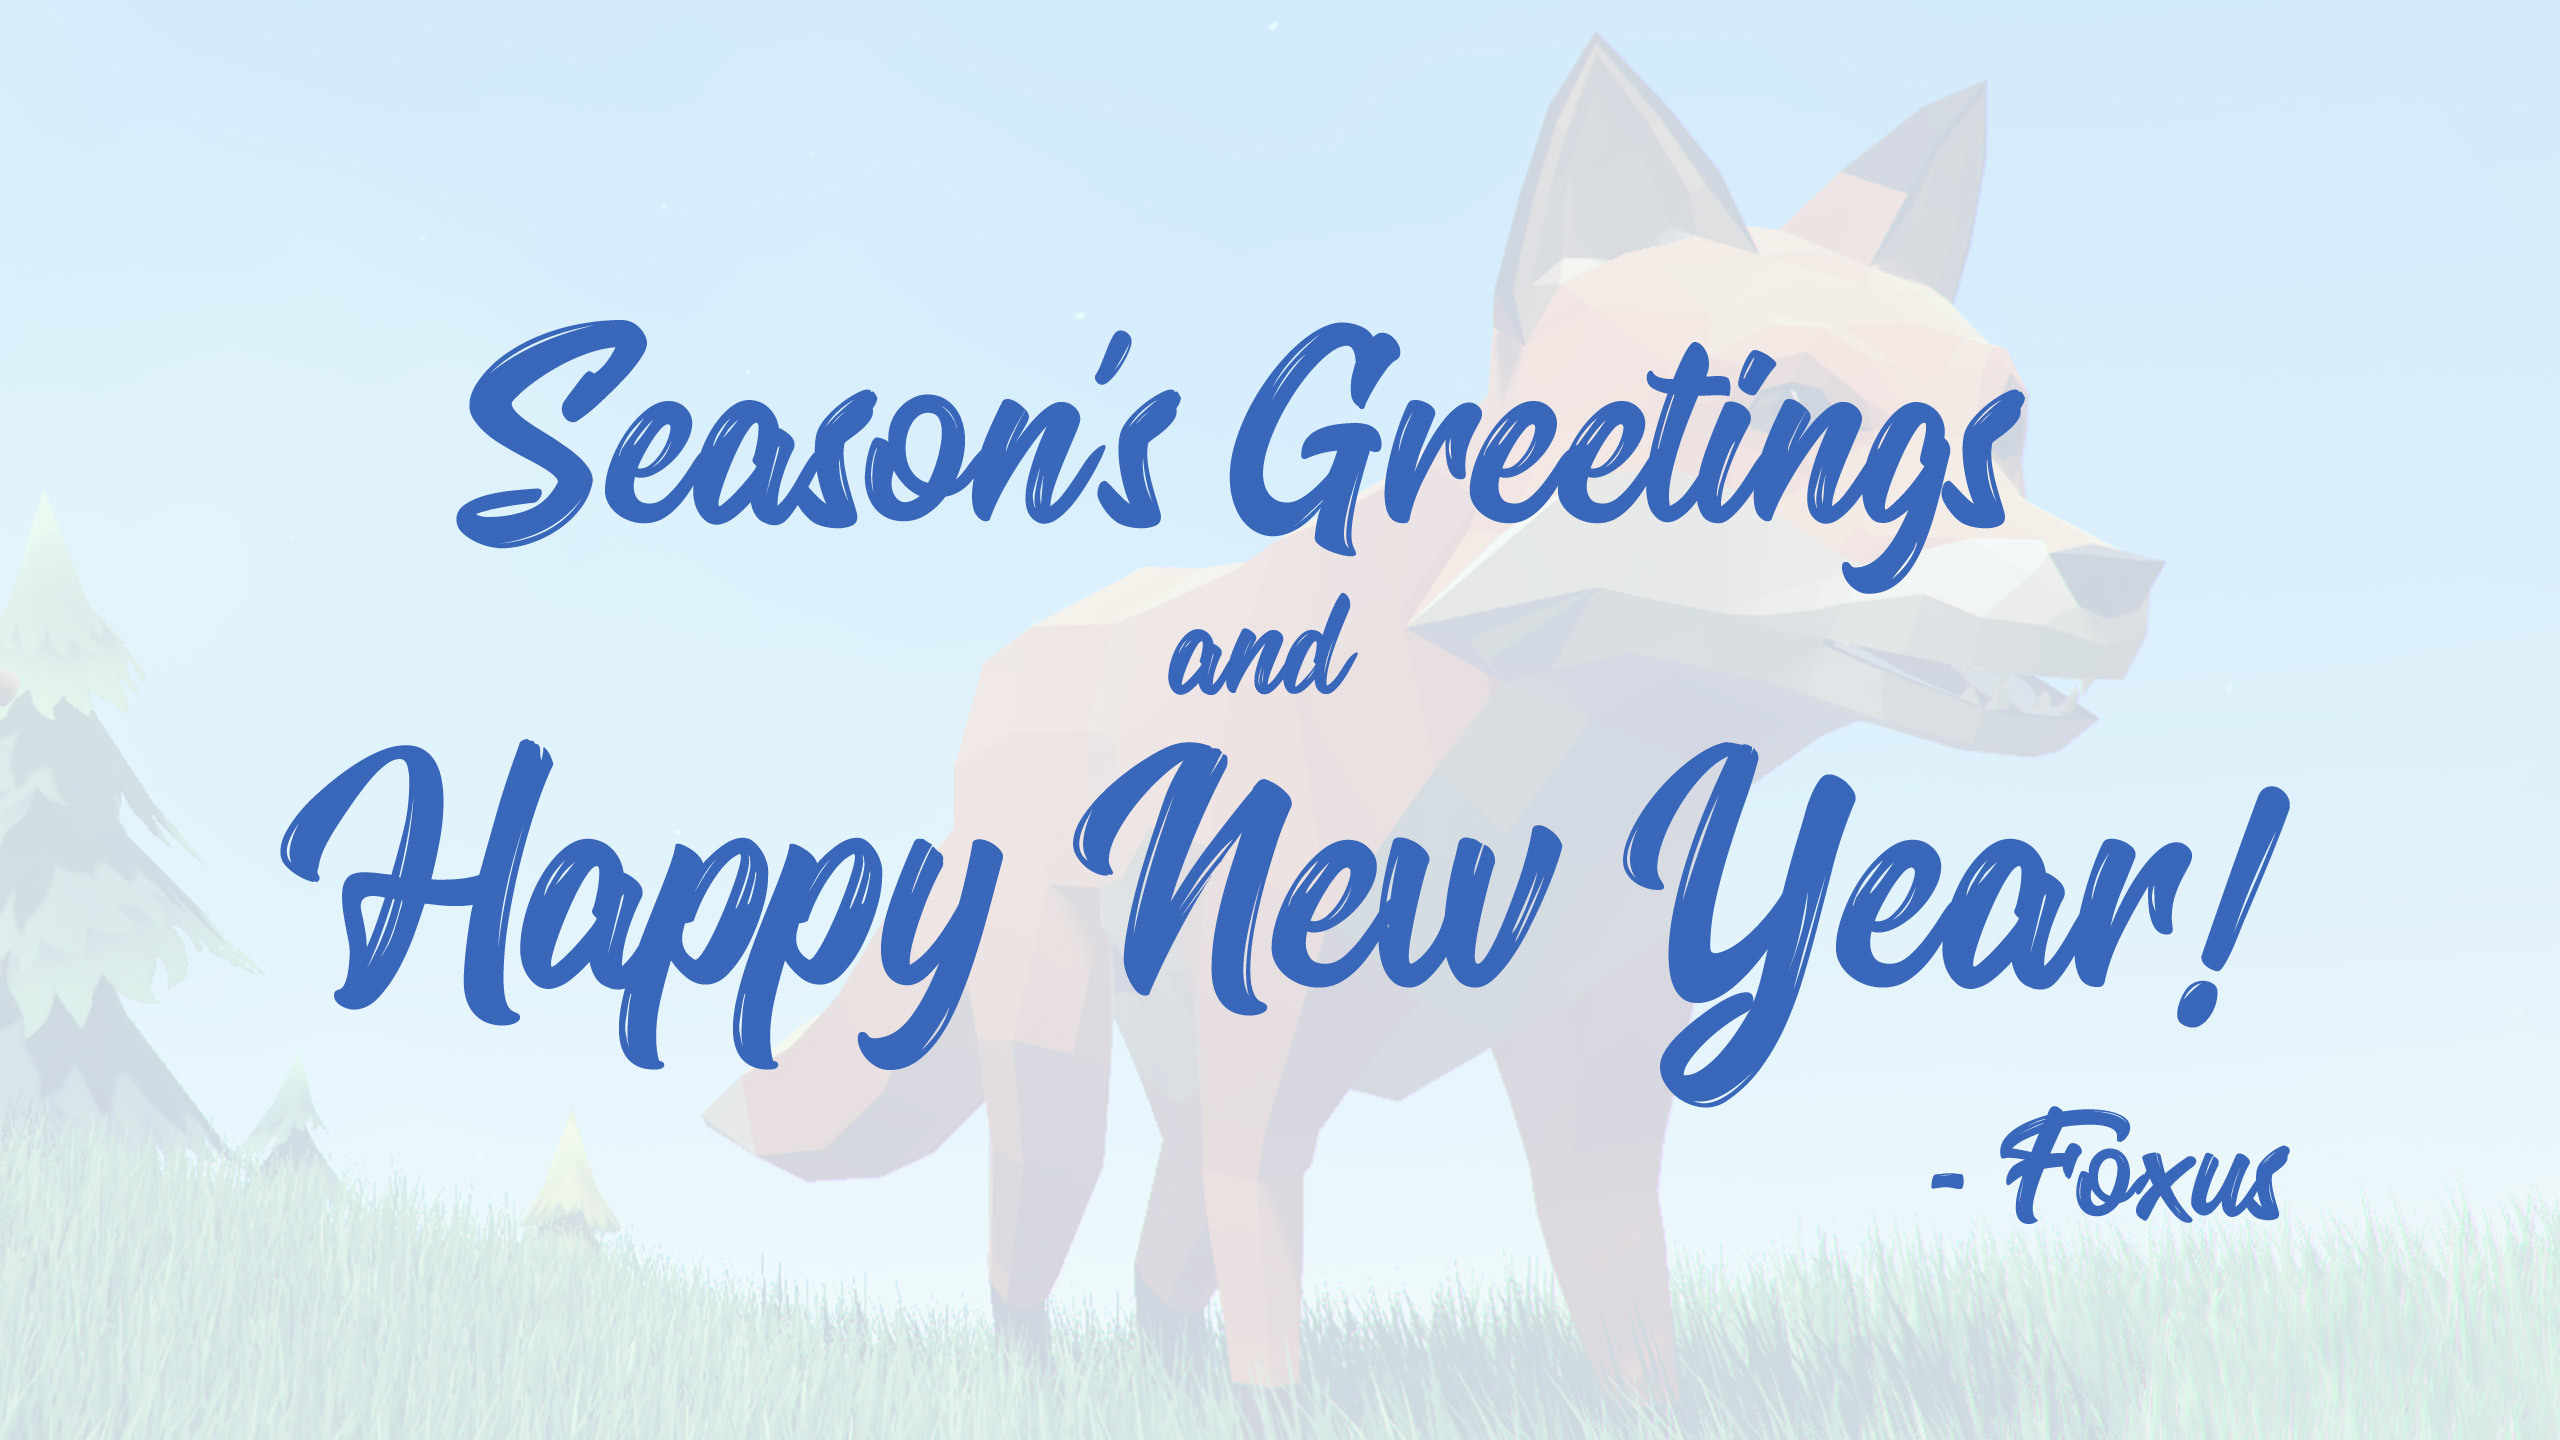 Foxus Seasons Greetings And Happy New Year